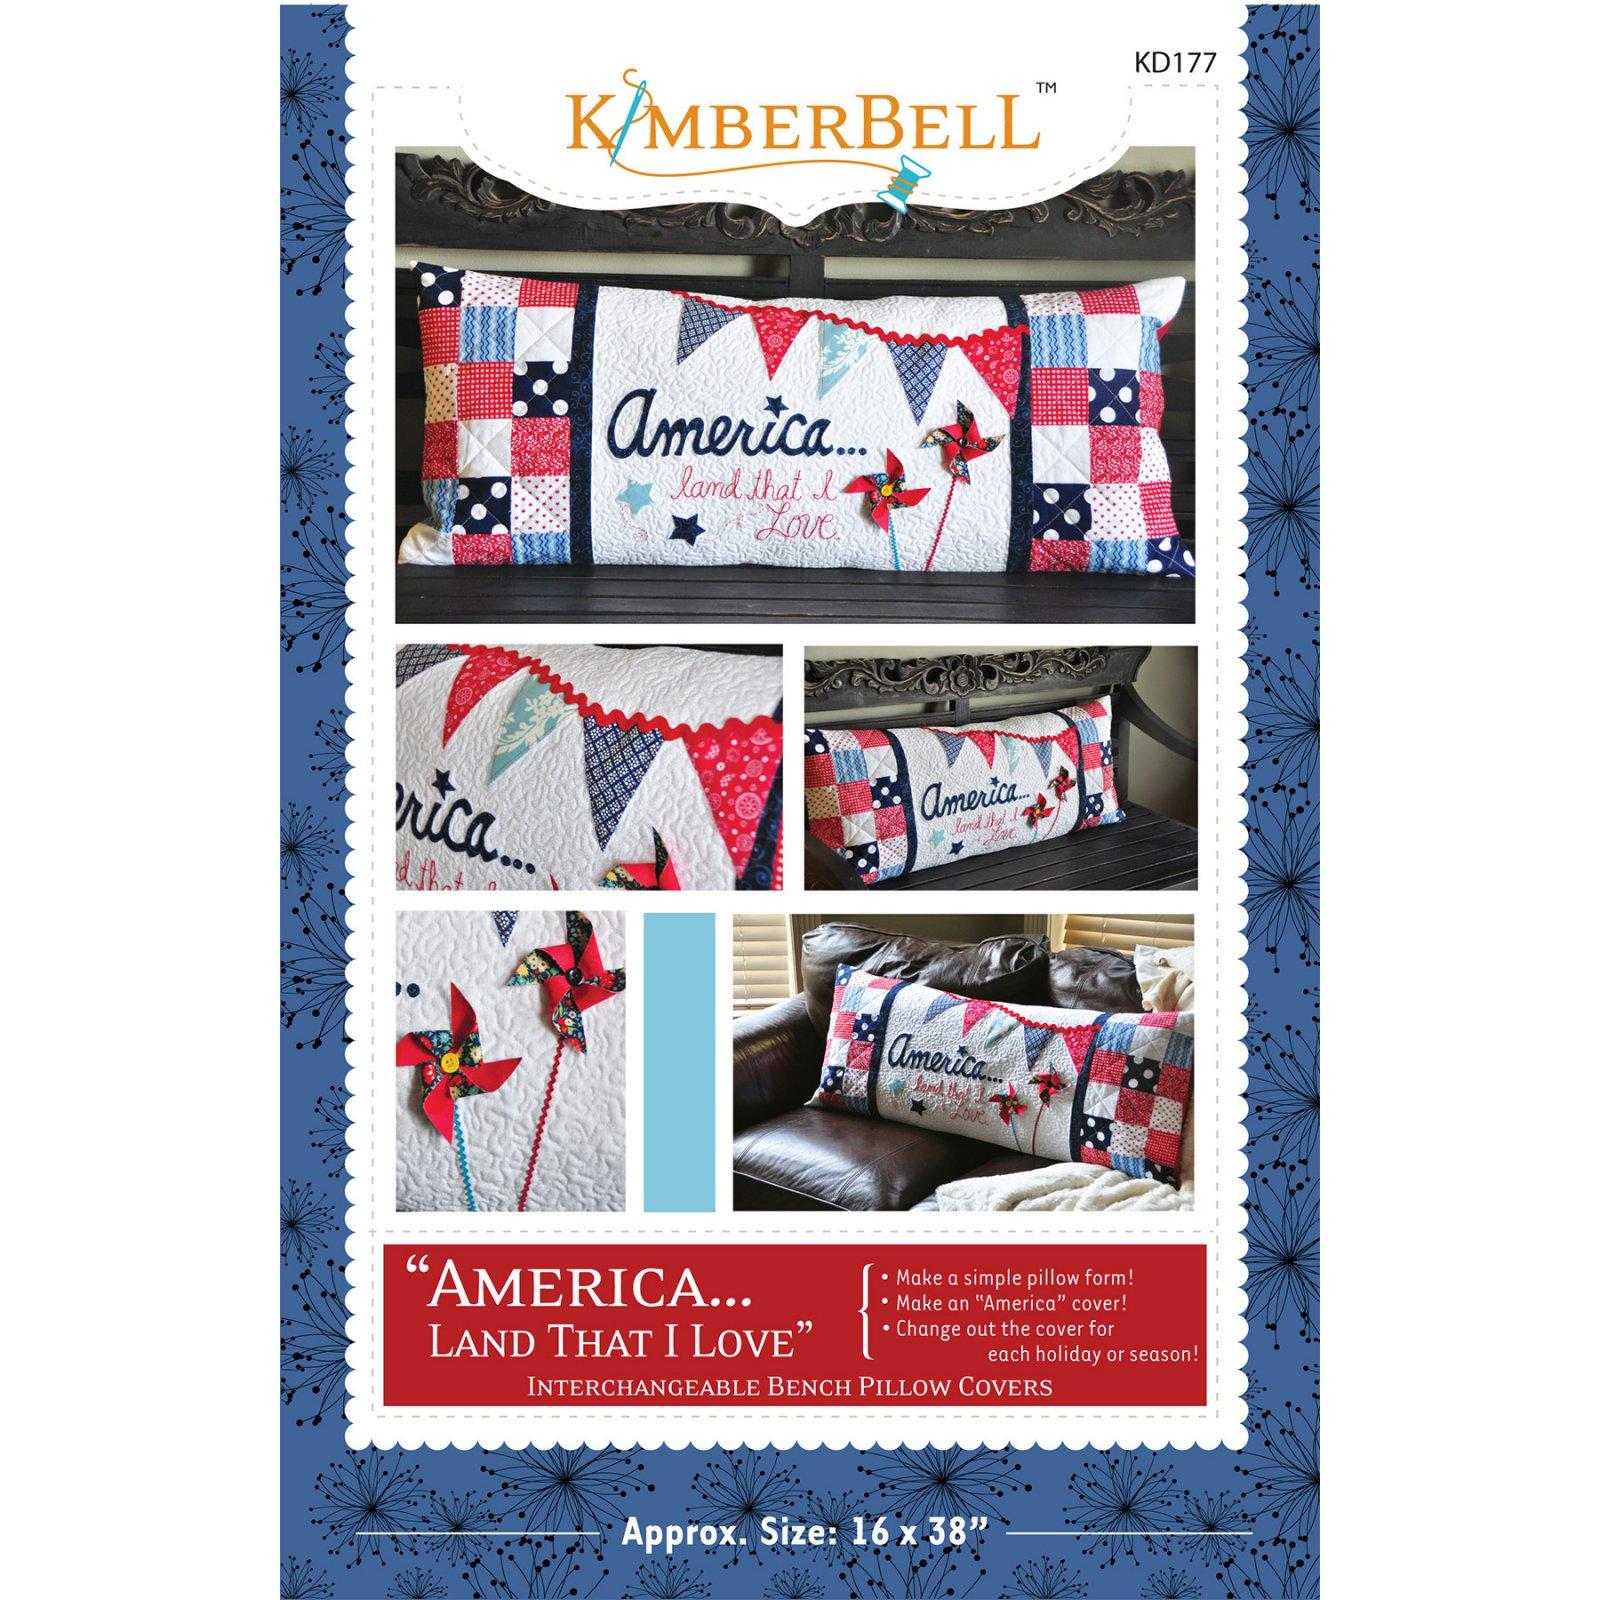 Kimberbell America Bench Pillow